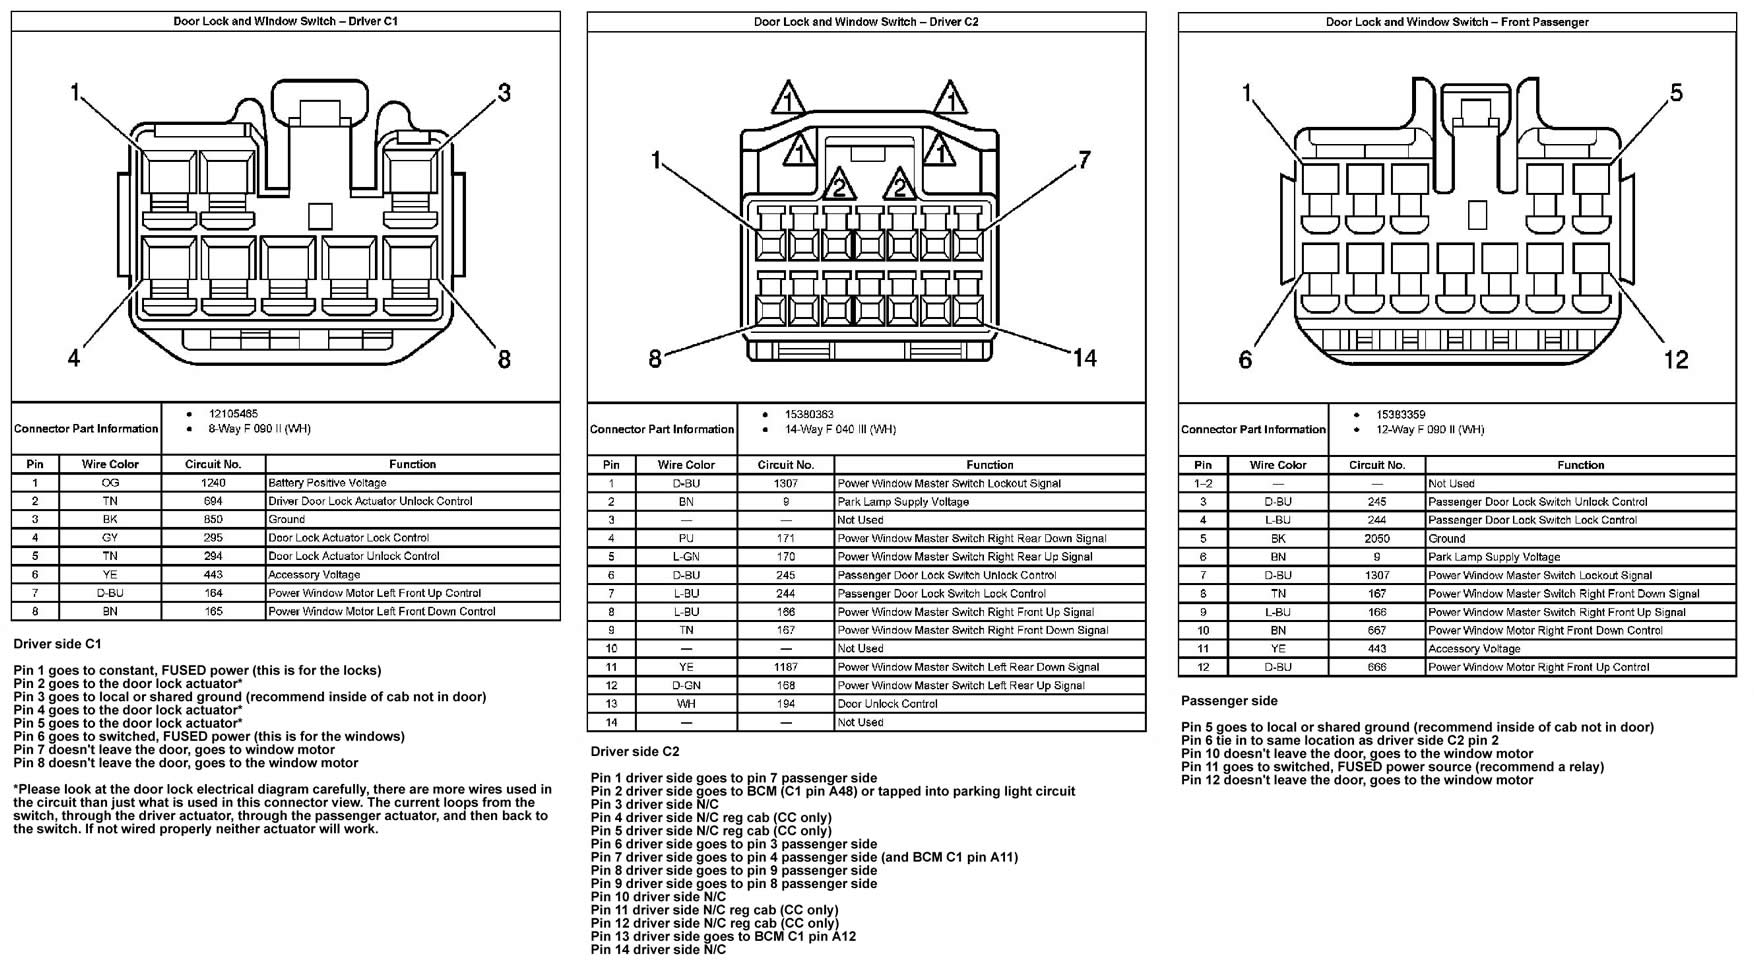 2004 gmc sierra wiring diagram bmw e46 pictures chevy truck 2005 gm power seat